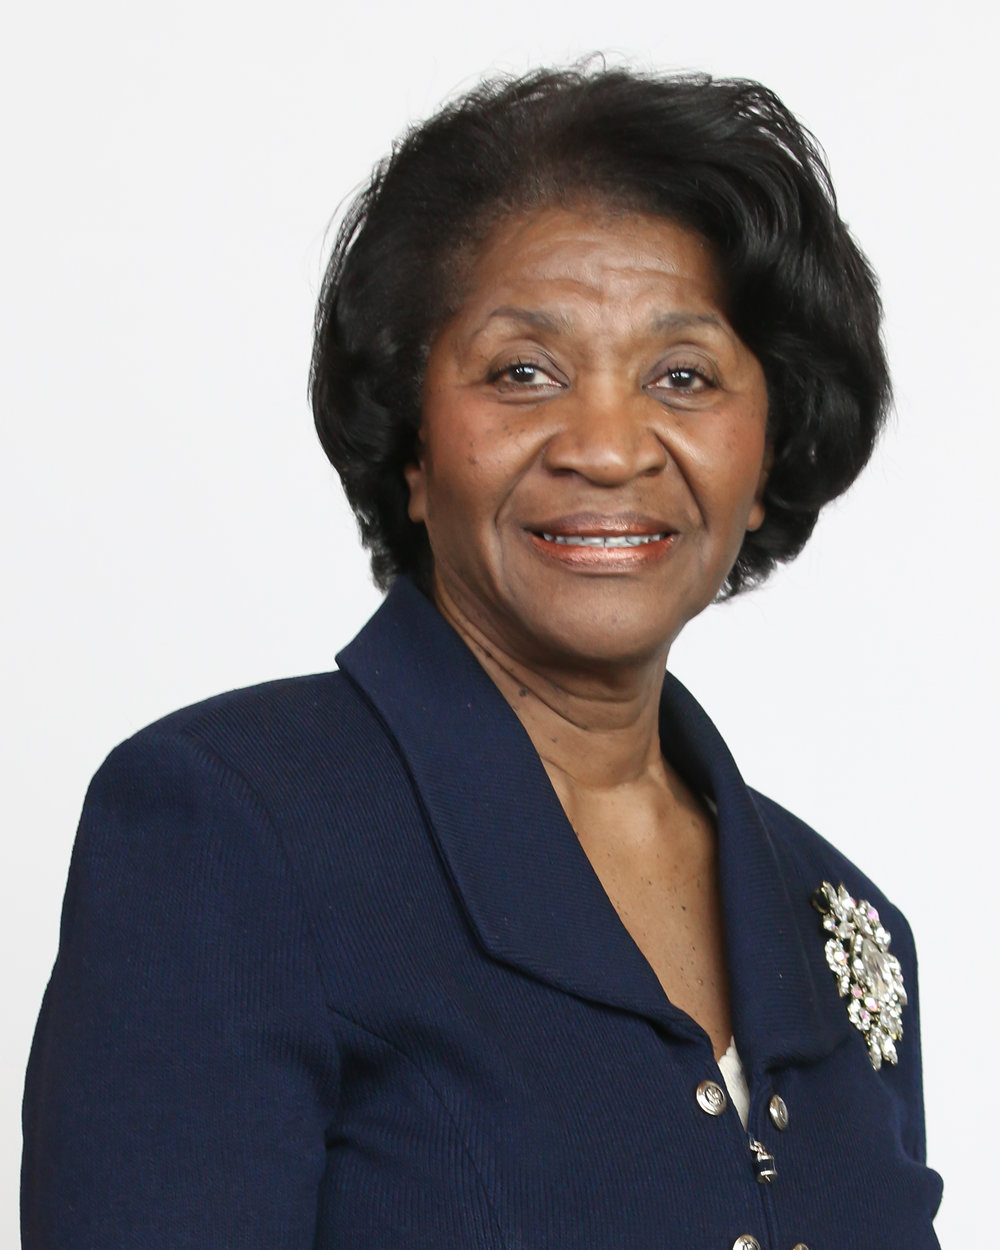 Cynthia Poole.JPG